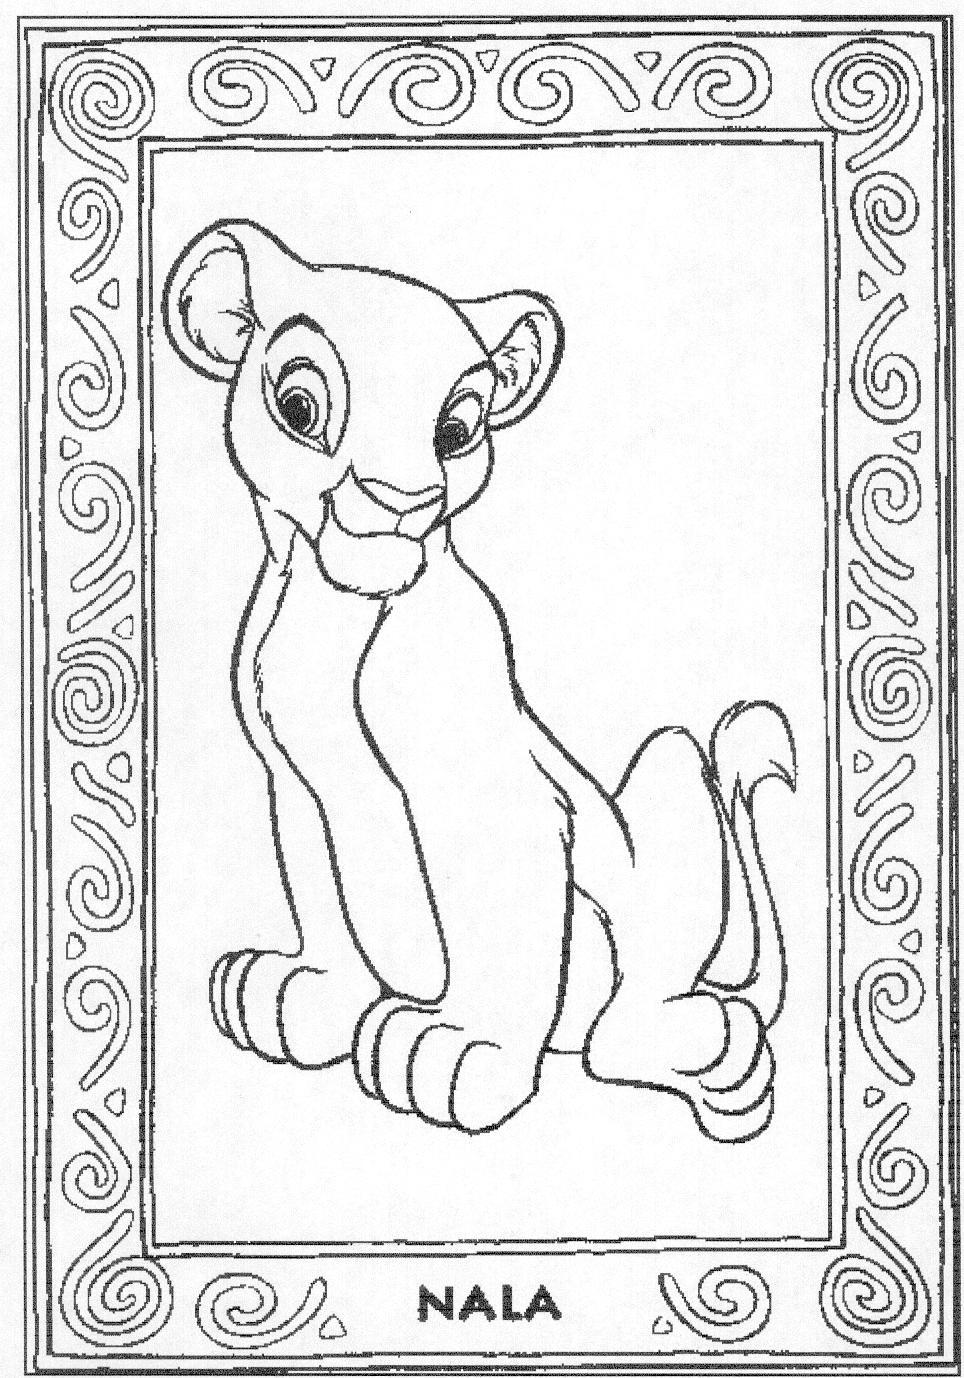 Lion King Coloring Pages Nala And Simba Az - Coloring Home